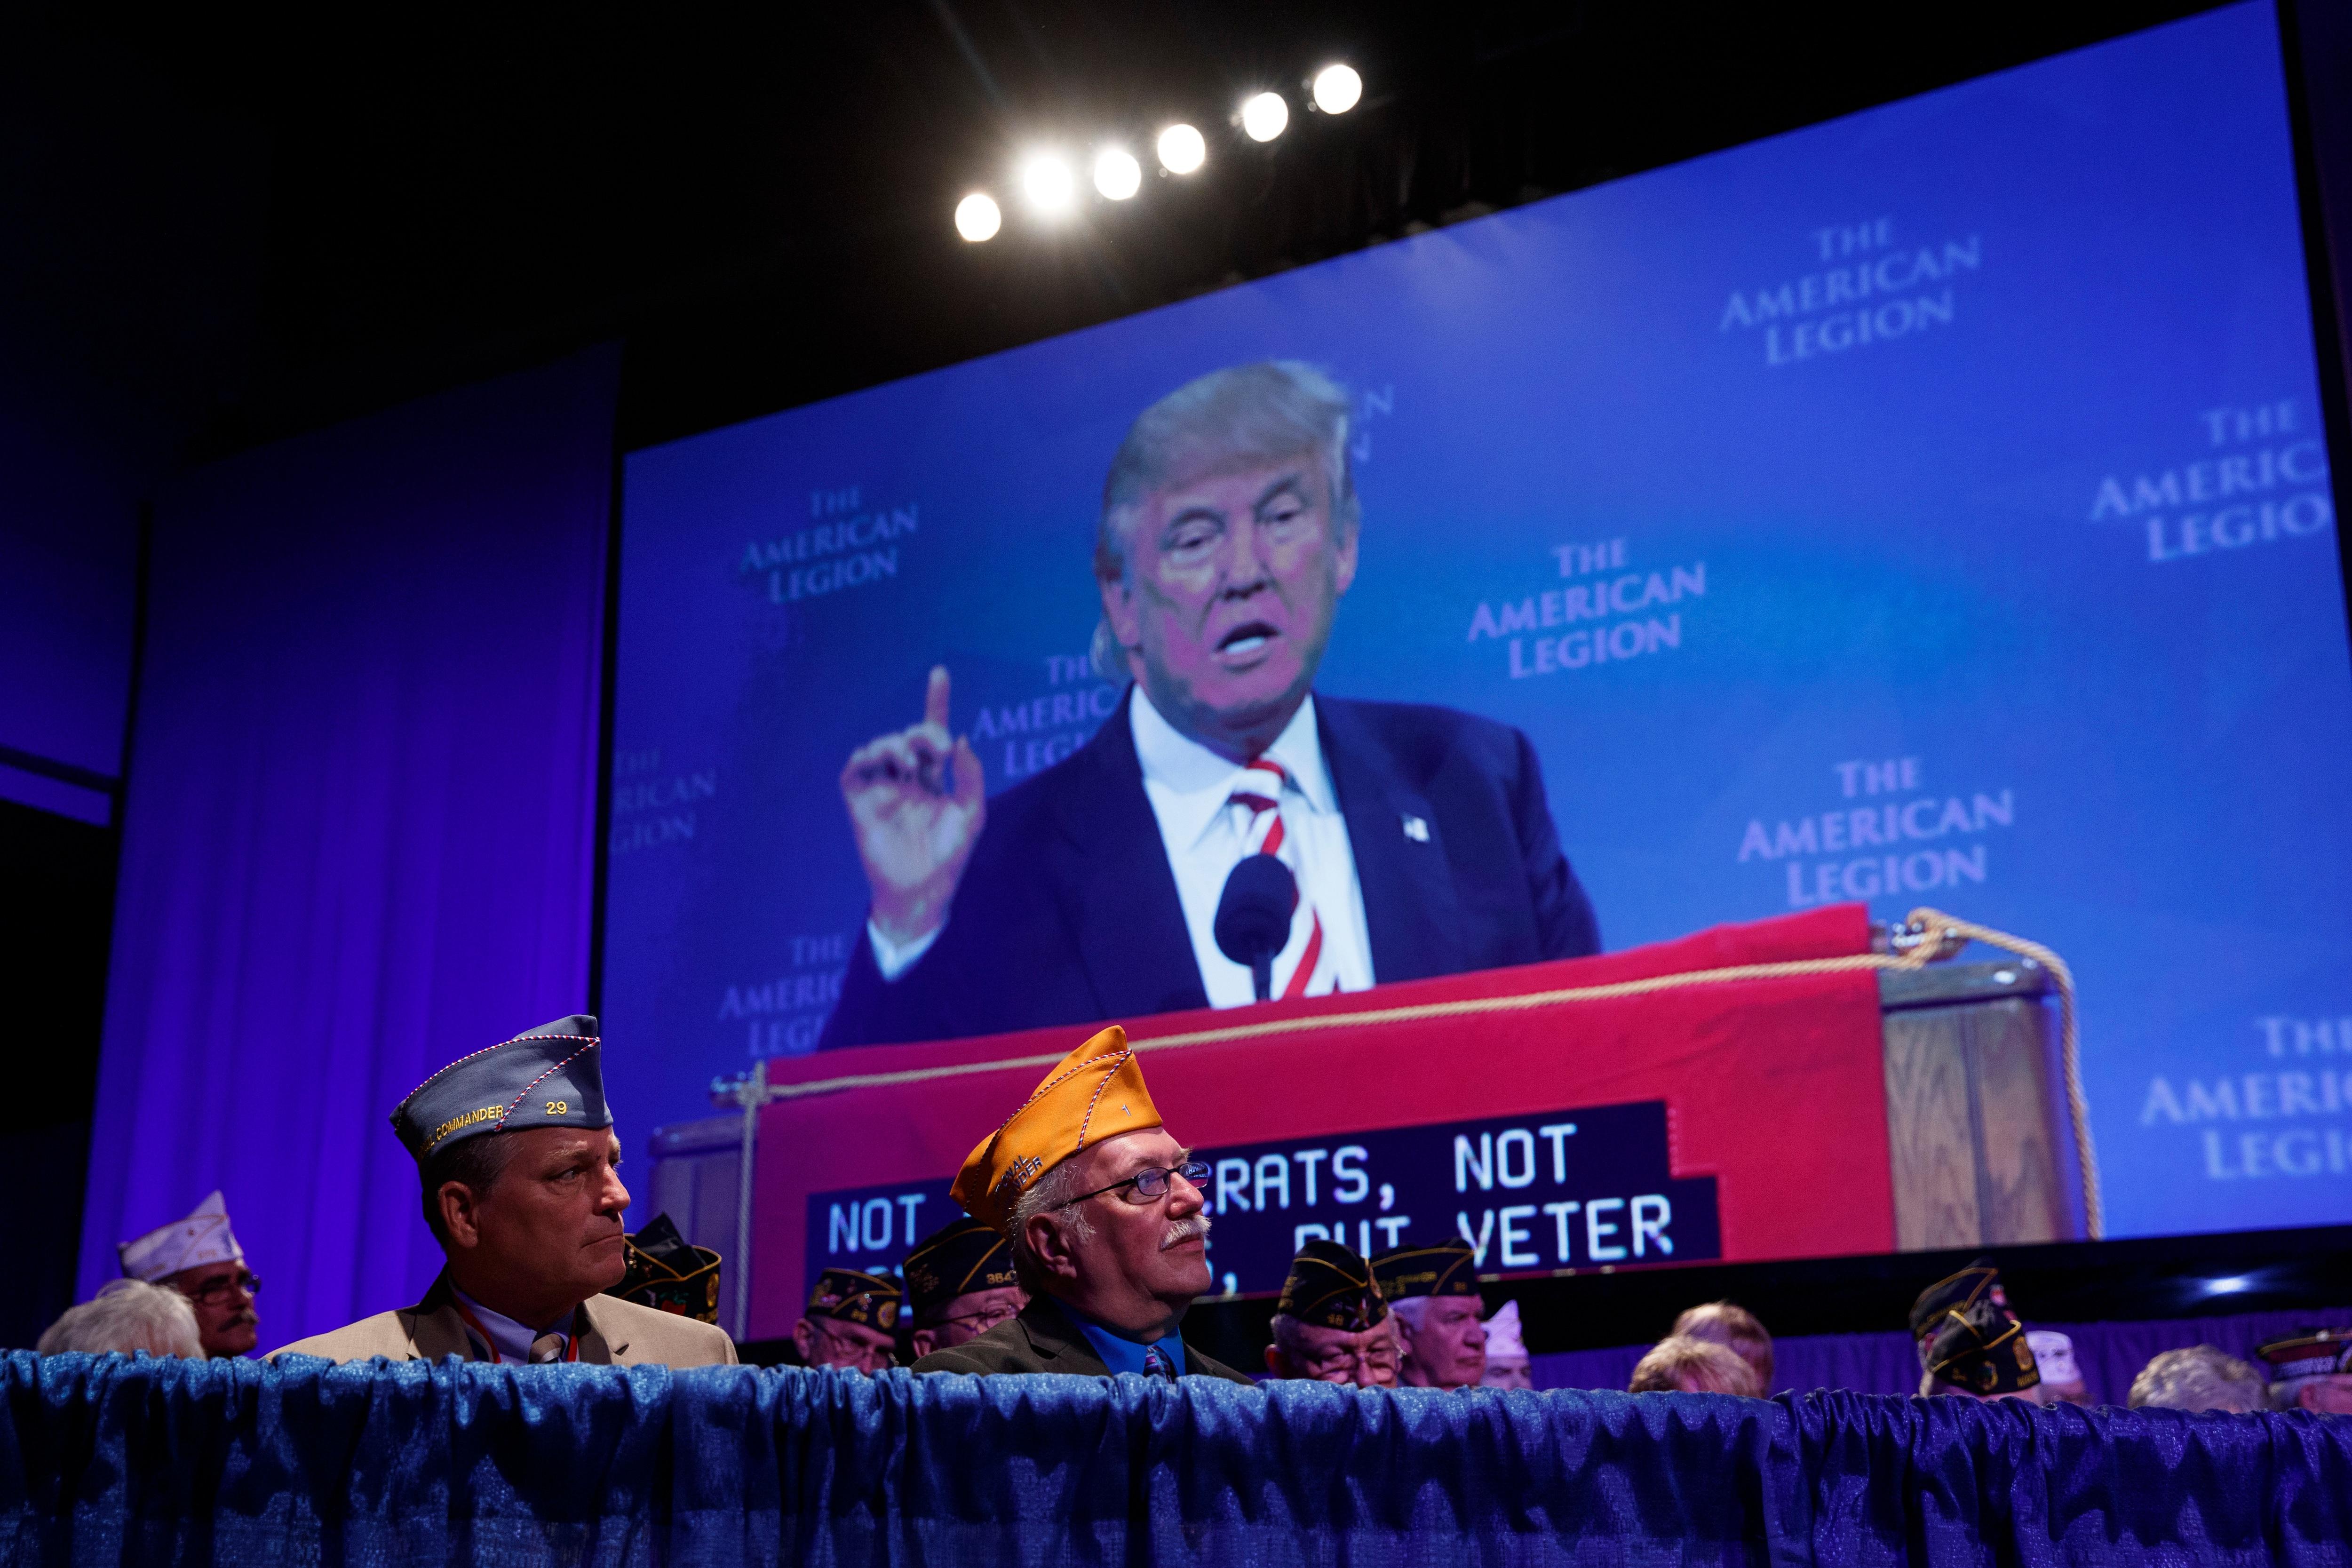 American Legion blasts Trump budget as 'stealth privatization' of VA